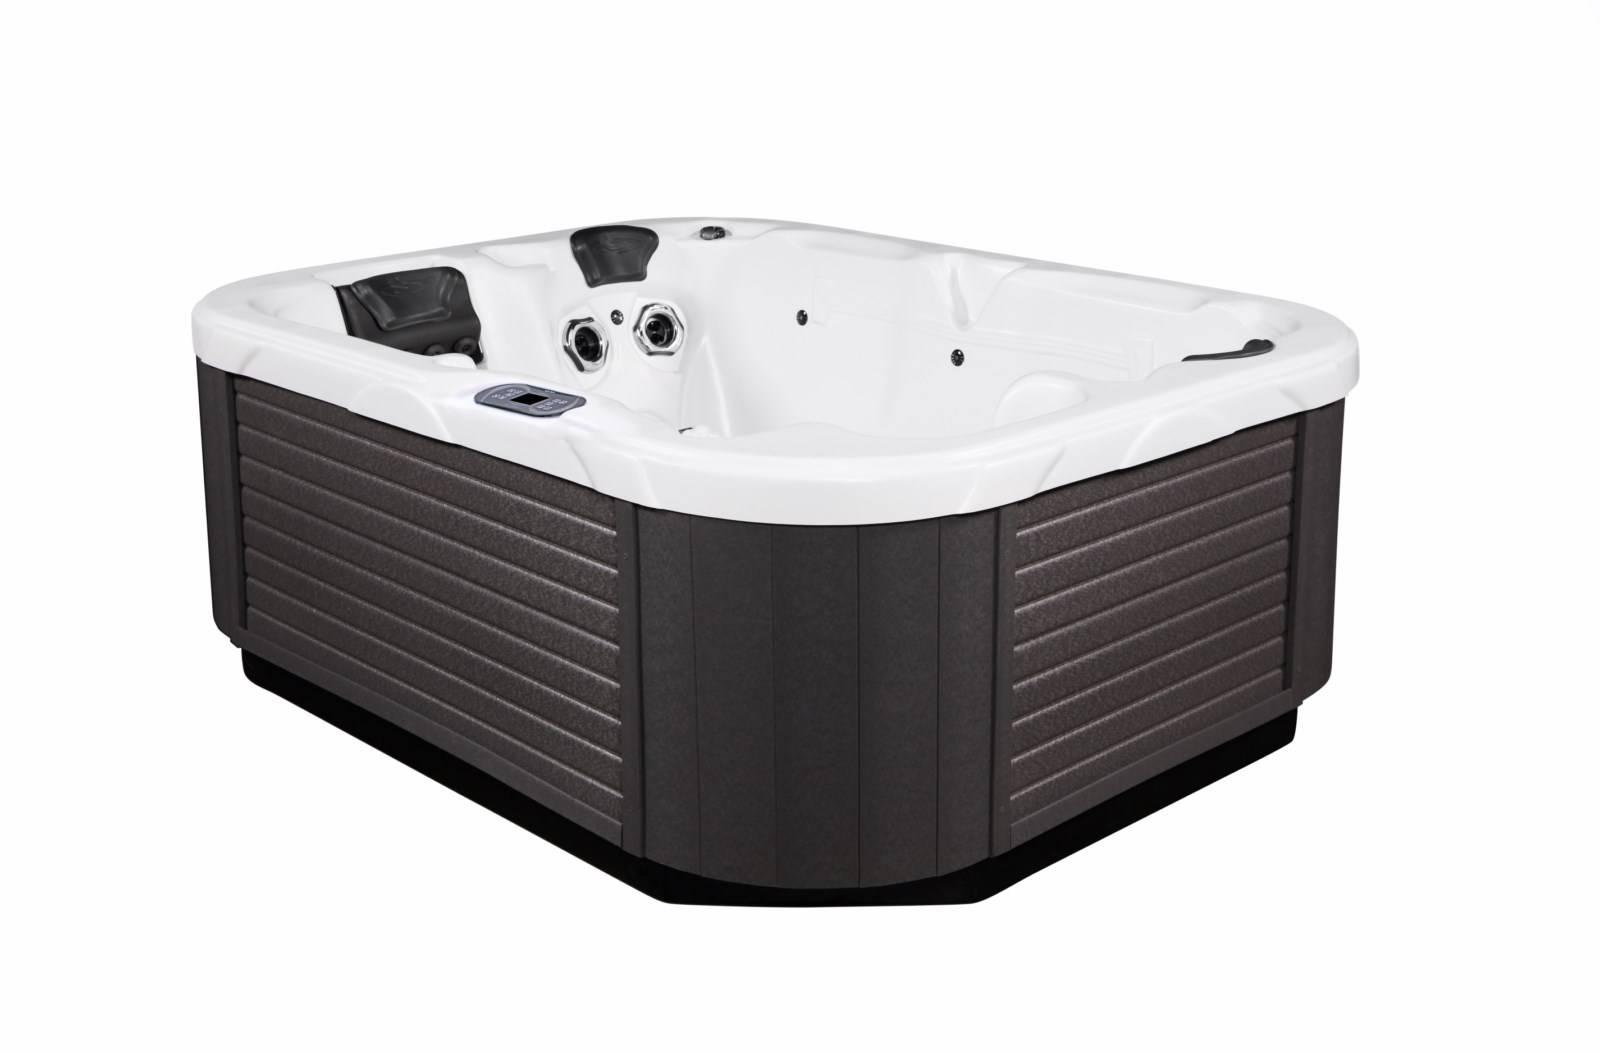 le spa jacuzzi 3 places le triad bayonne. Black Bedroom Furniture Sets. Home Design Ideas